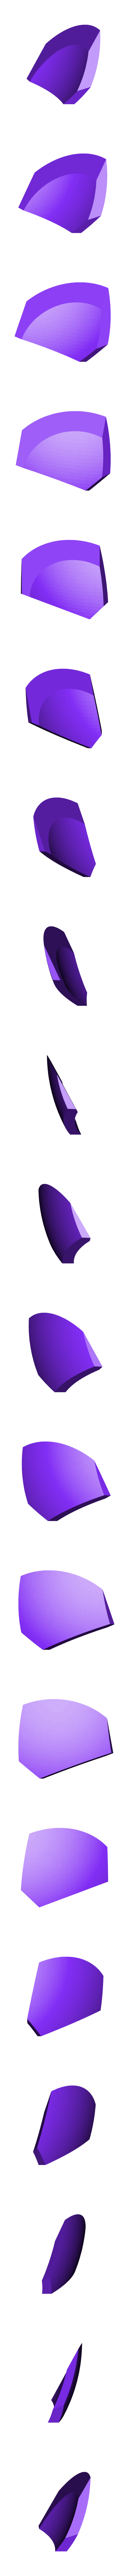 Armor-Left.stl Download STL file Hammond's Wrecking Ball Mech from Overwatch • 3D printer template, FunbieStudios